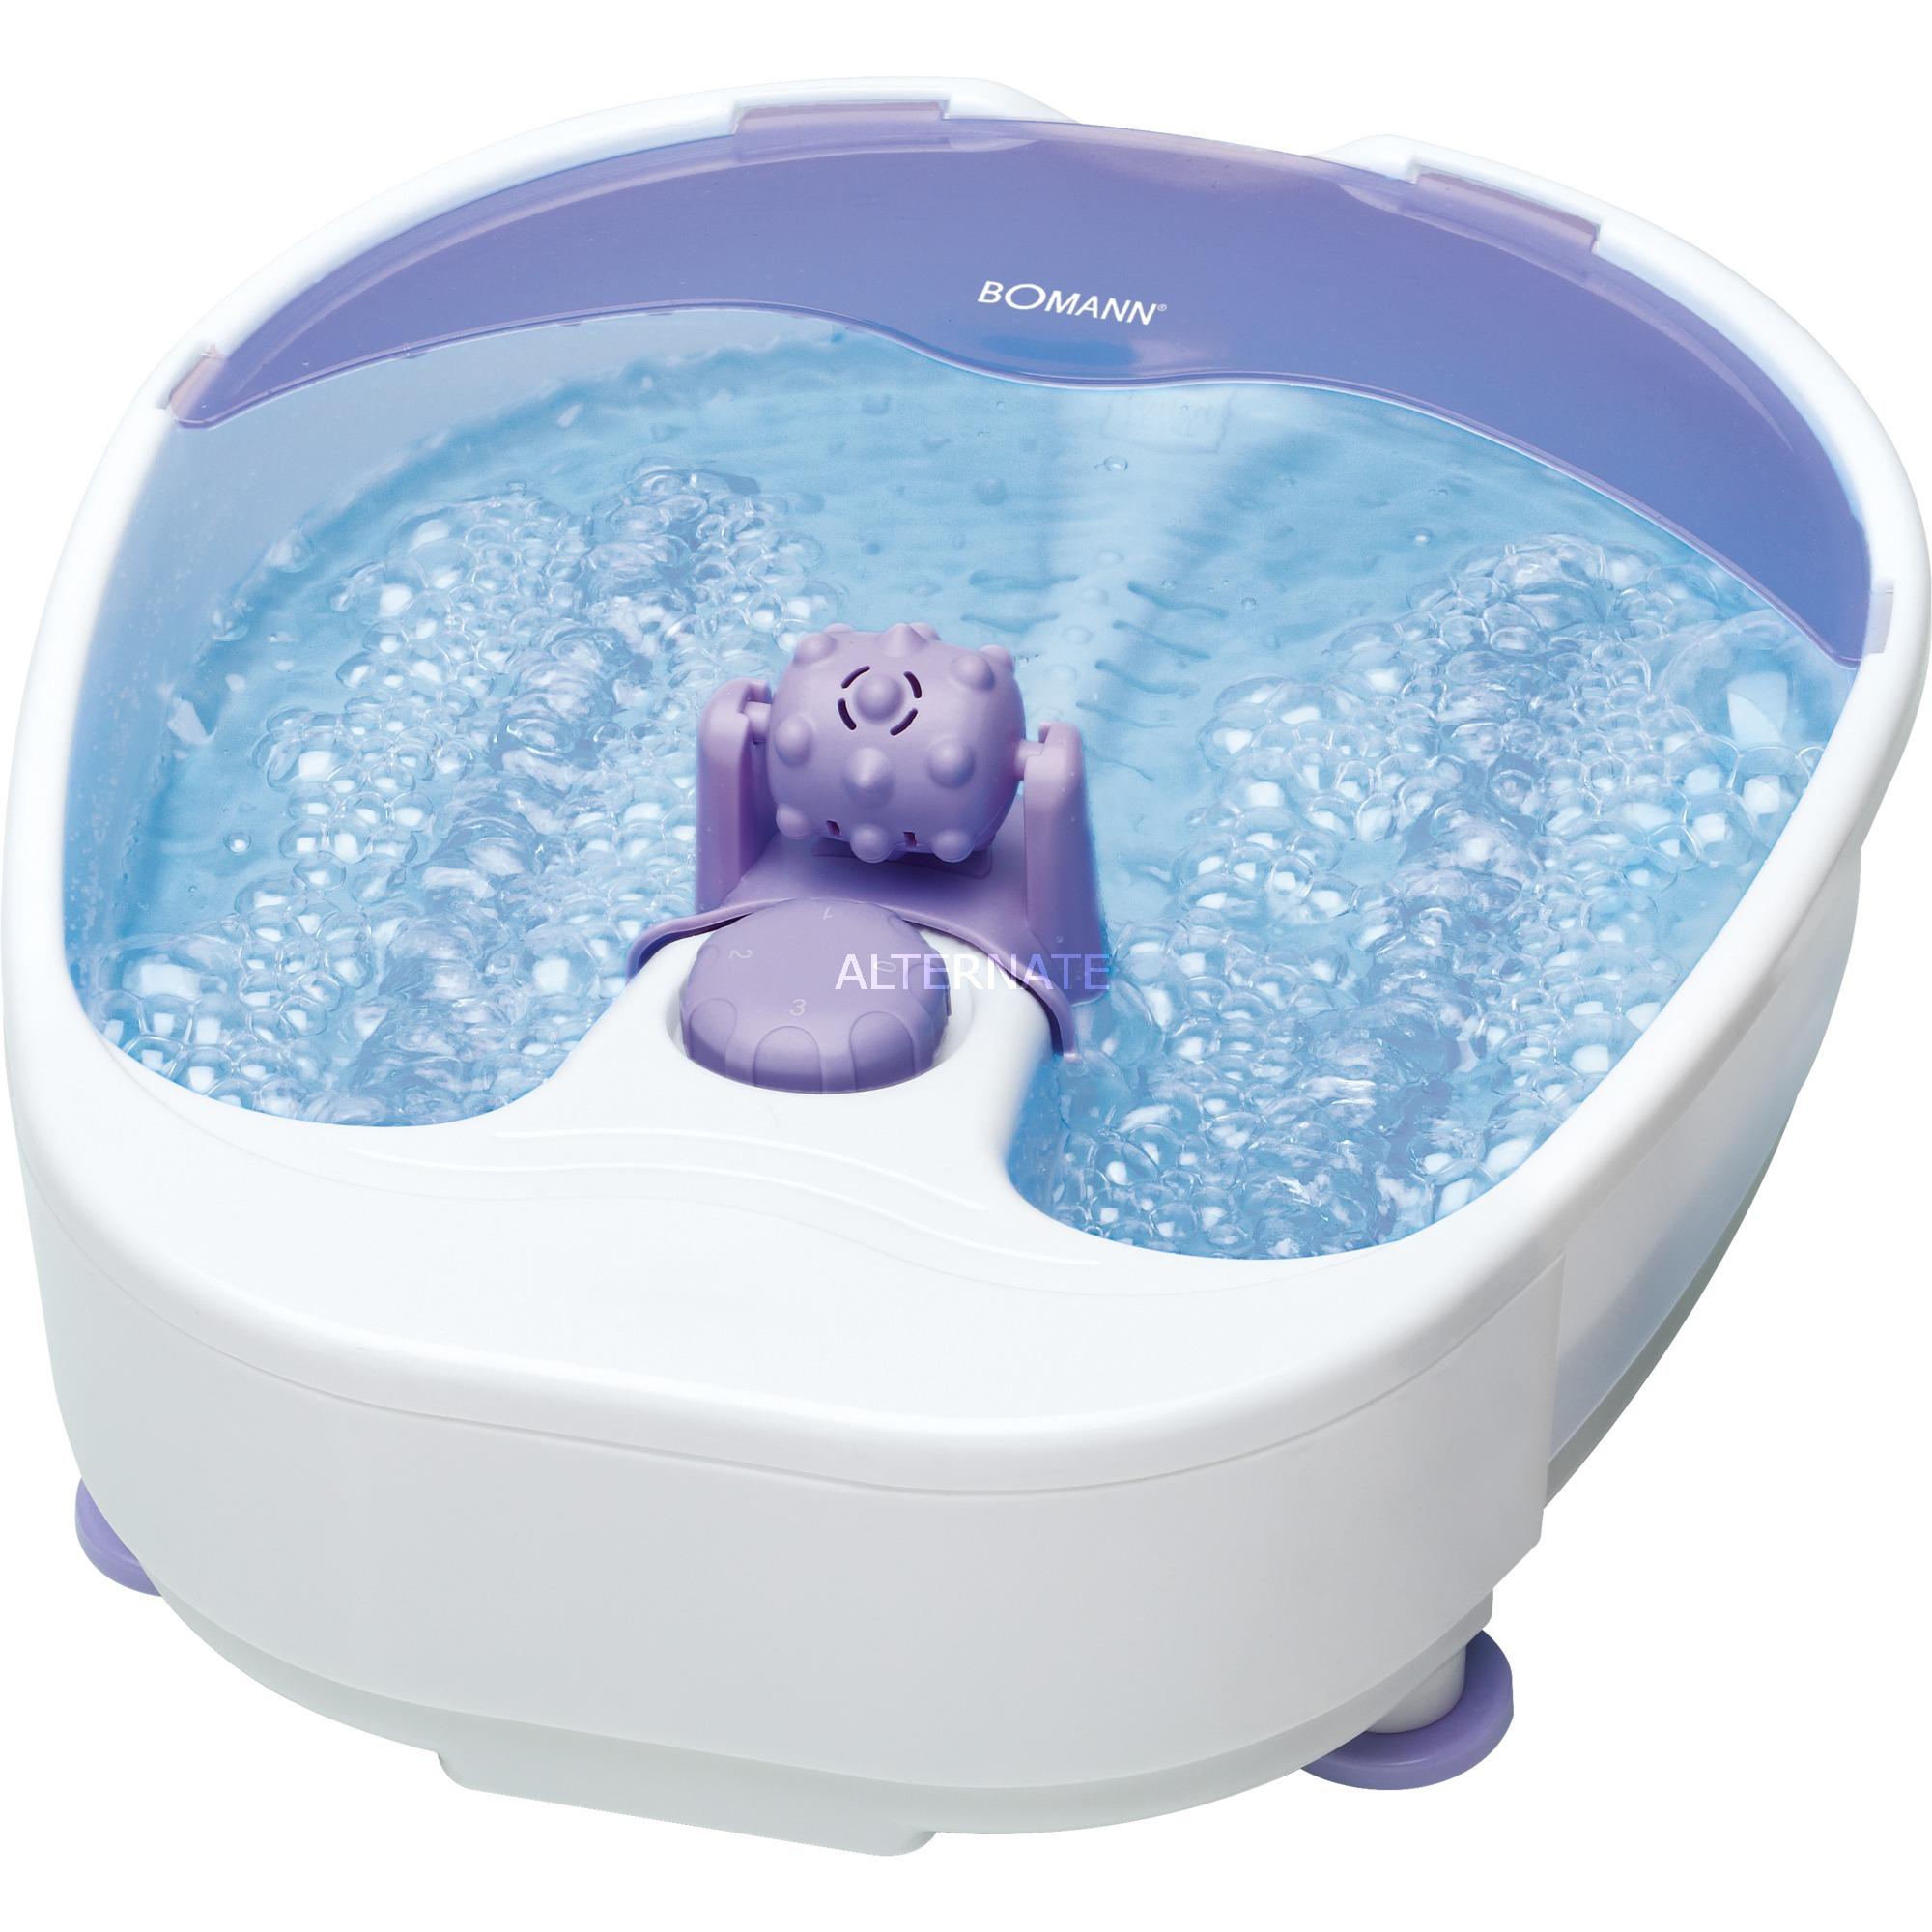 FM 8000 CB bañera de pies Violeta, Blanco 90 W, Baño para pies